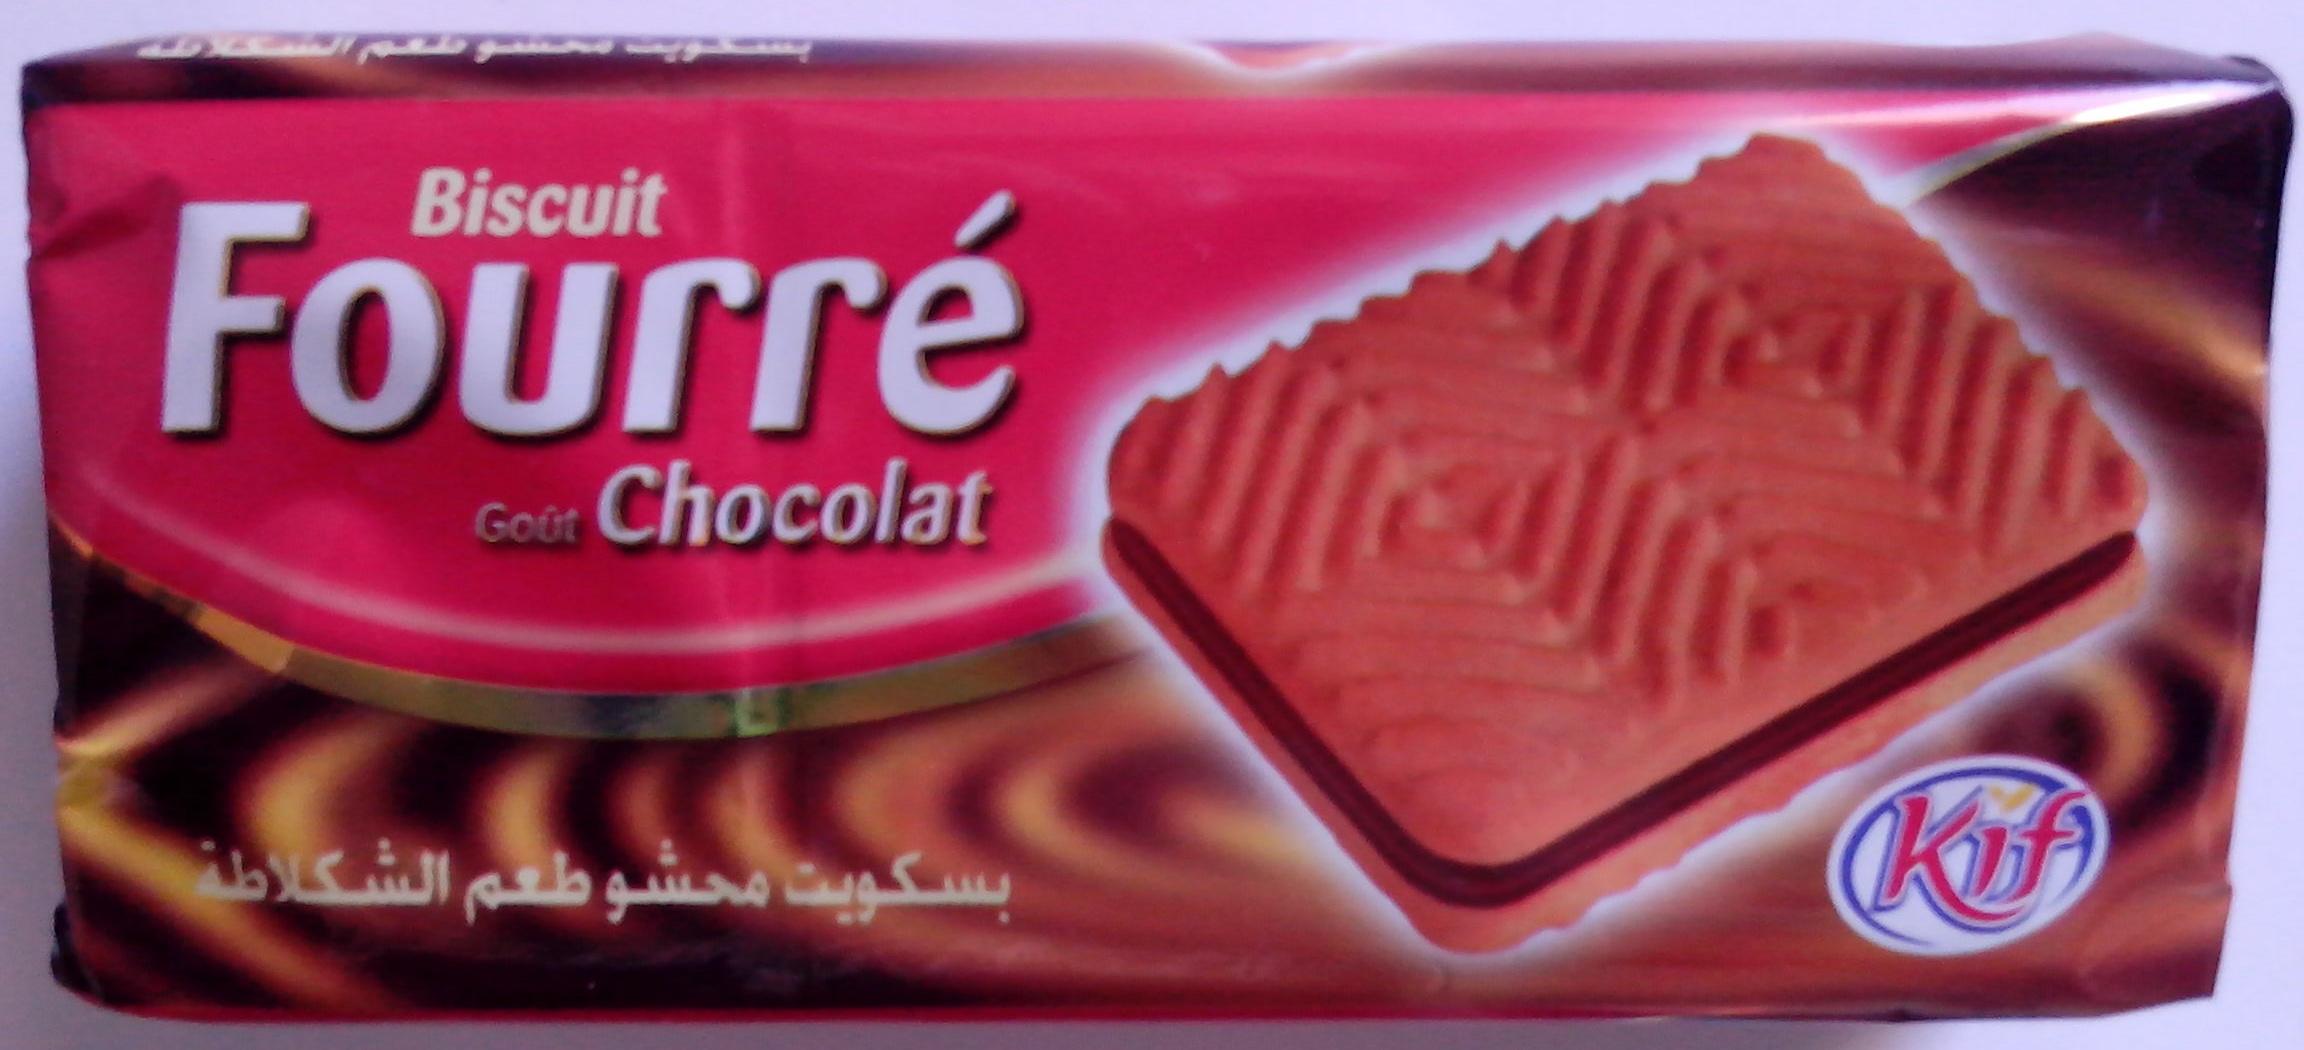 Fourré - Kif - Product - fr